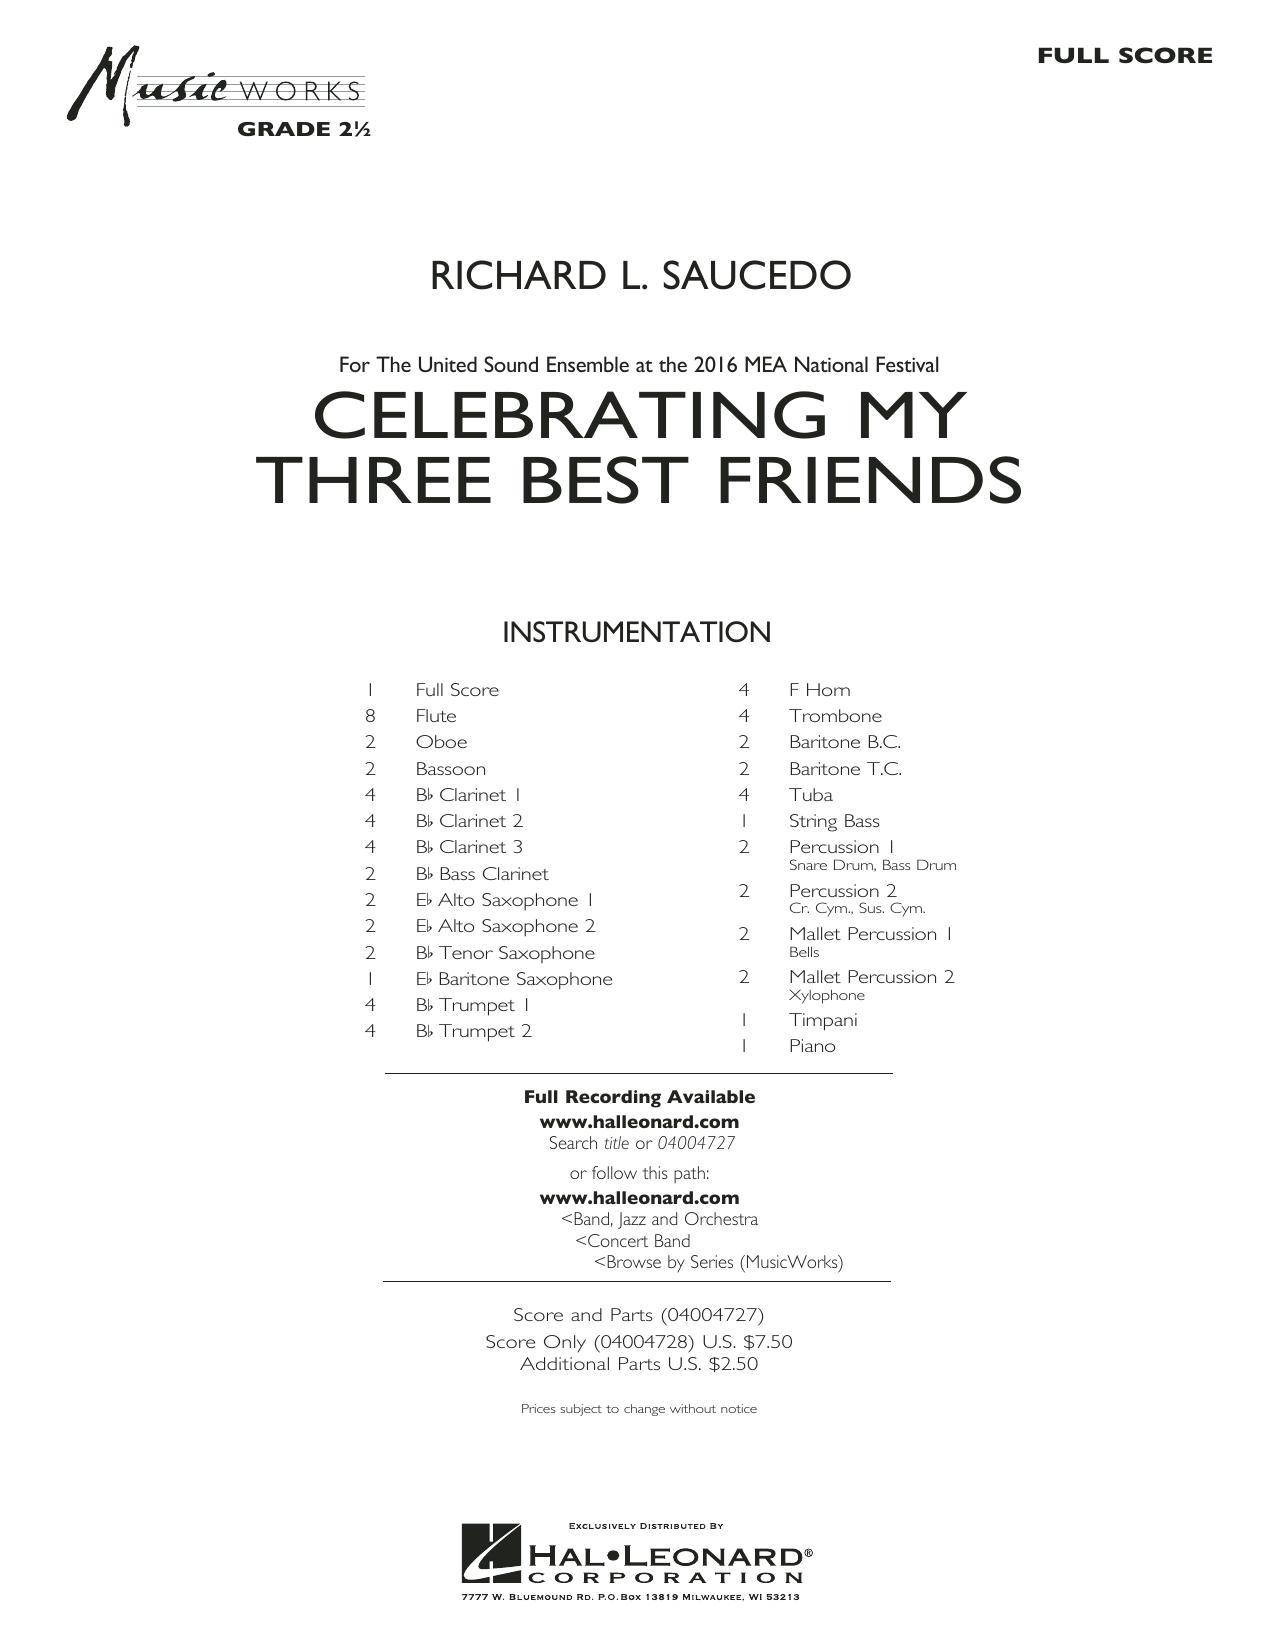 Celebrating My Three Best Friends - Full Score (Concert Band)